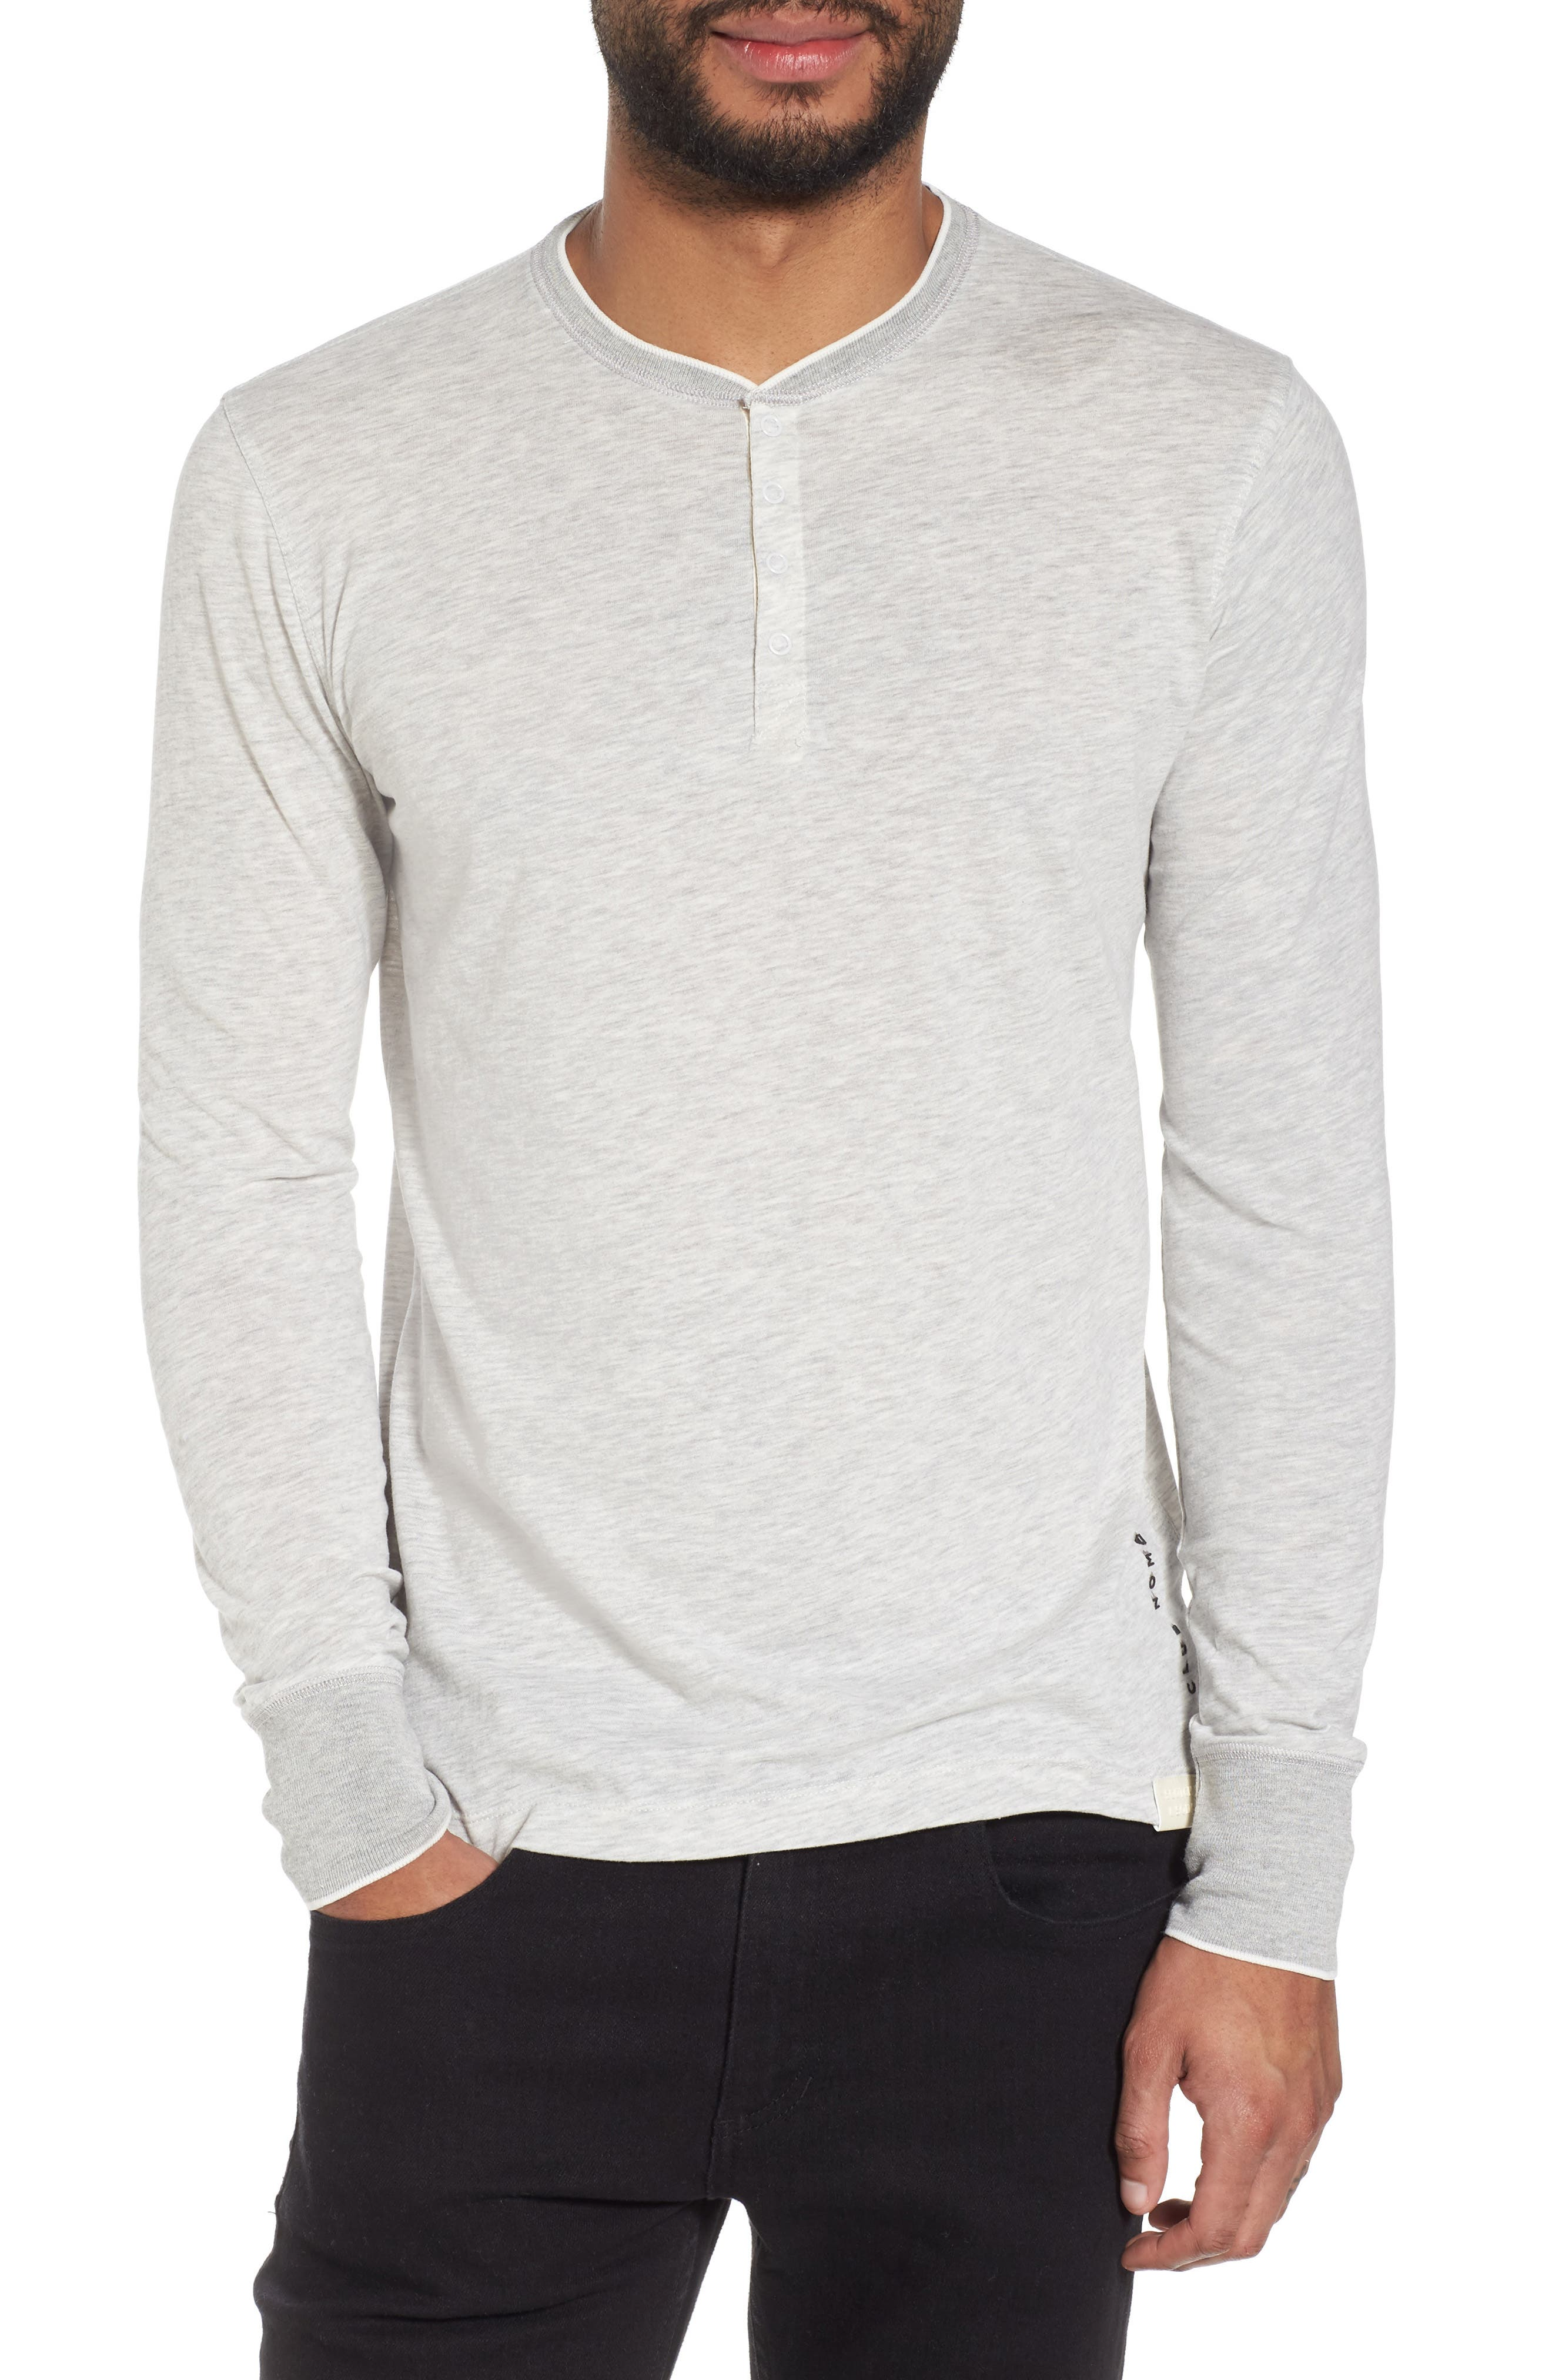 Club Nomade Soft Granddad T-Shirt,                         Main,                         color, 020